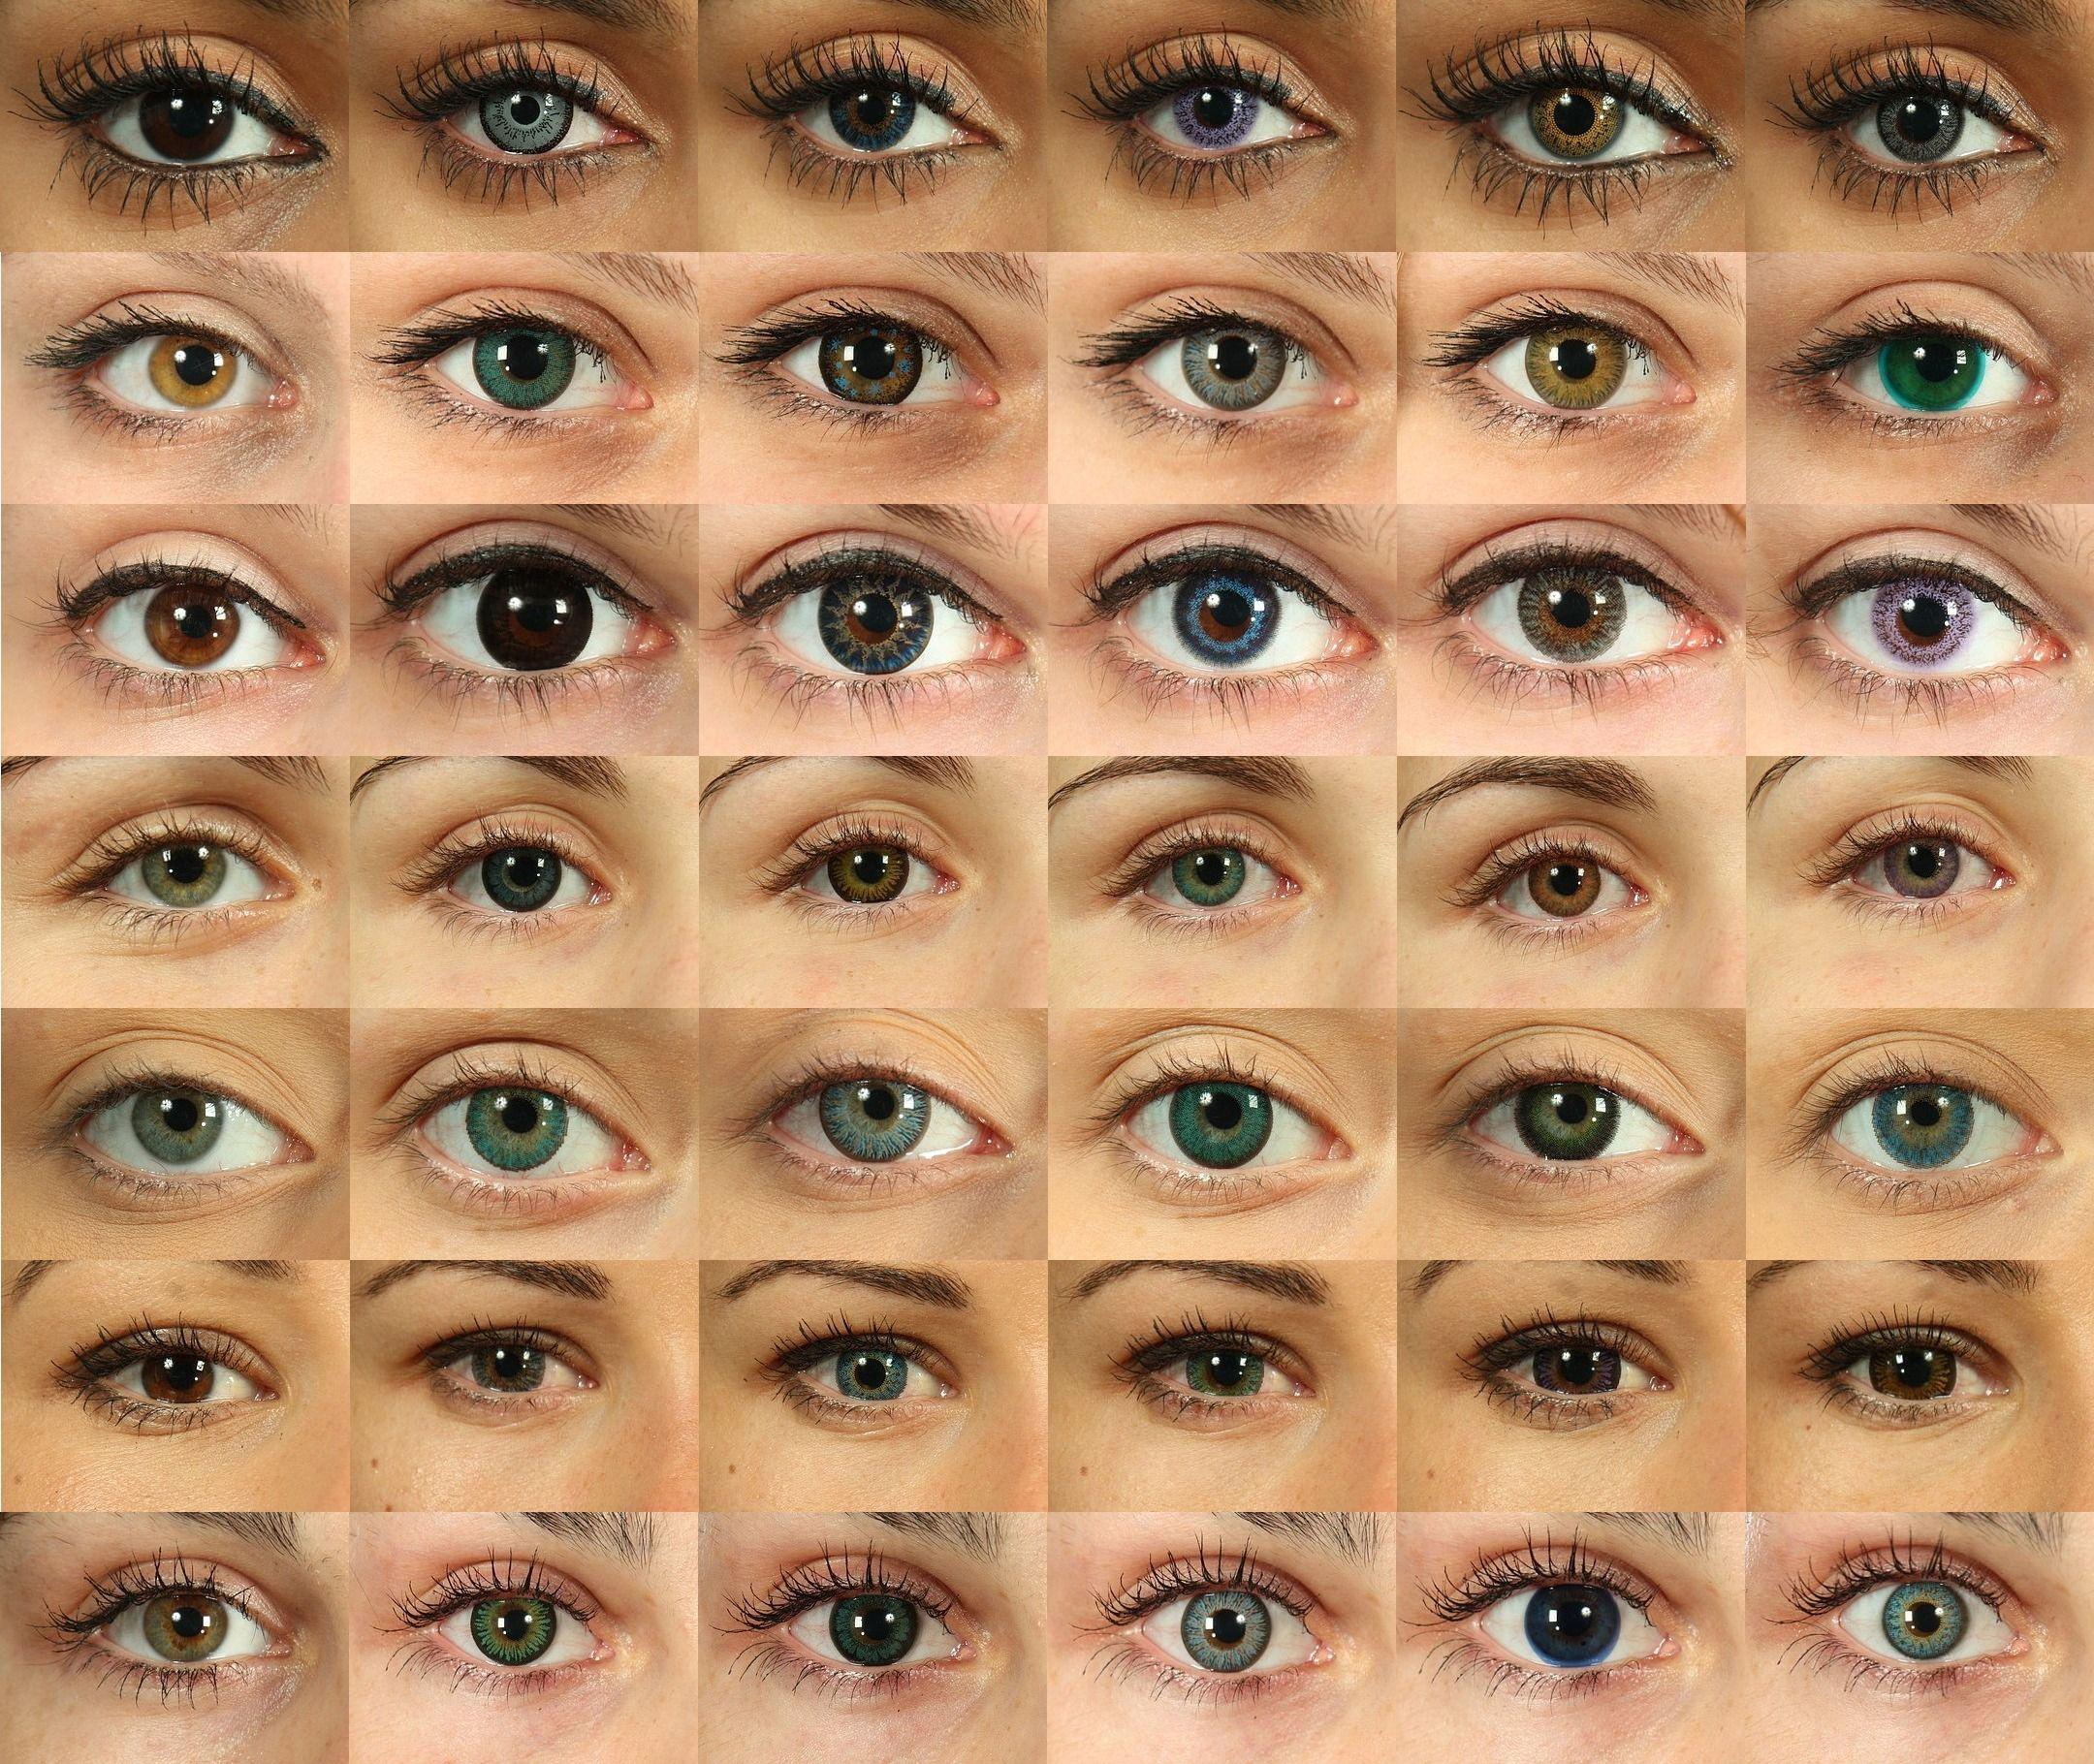 Eyes | week-end, shooting effectively hundreds of close-up photos of eyes ...